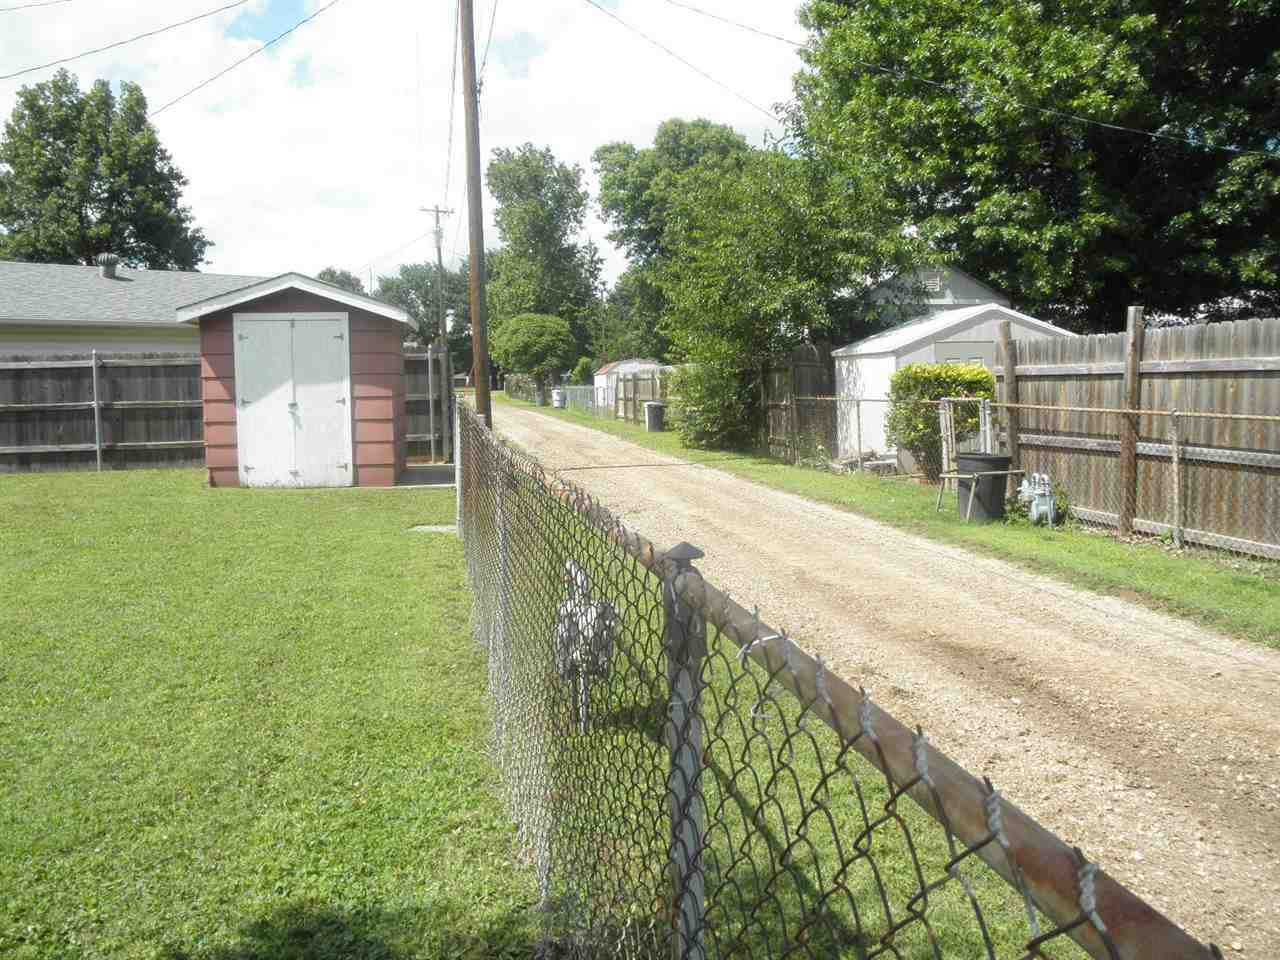 Sold Intraoffice W/MLS | 1209 N Ash Ponca City, OK 74601 15